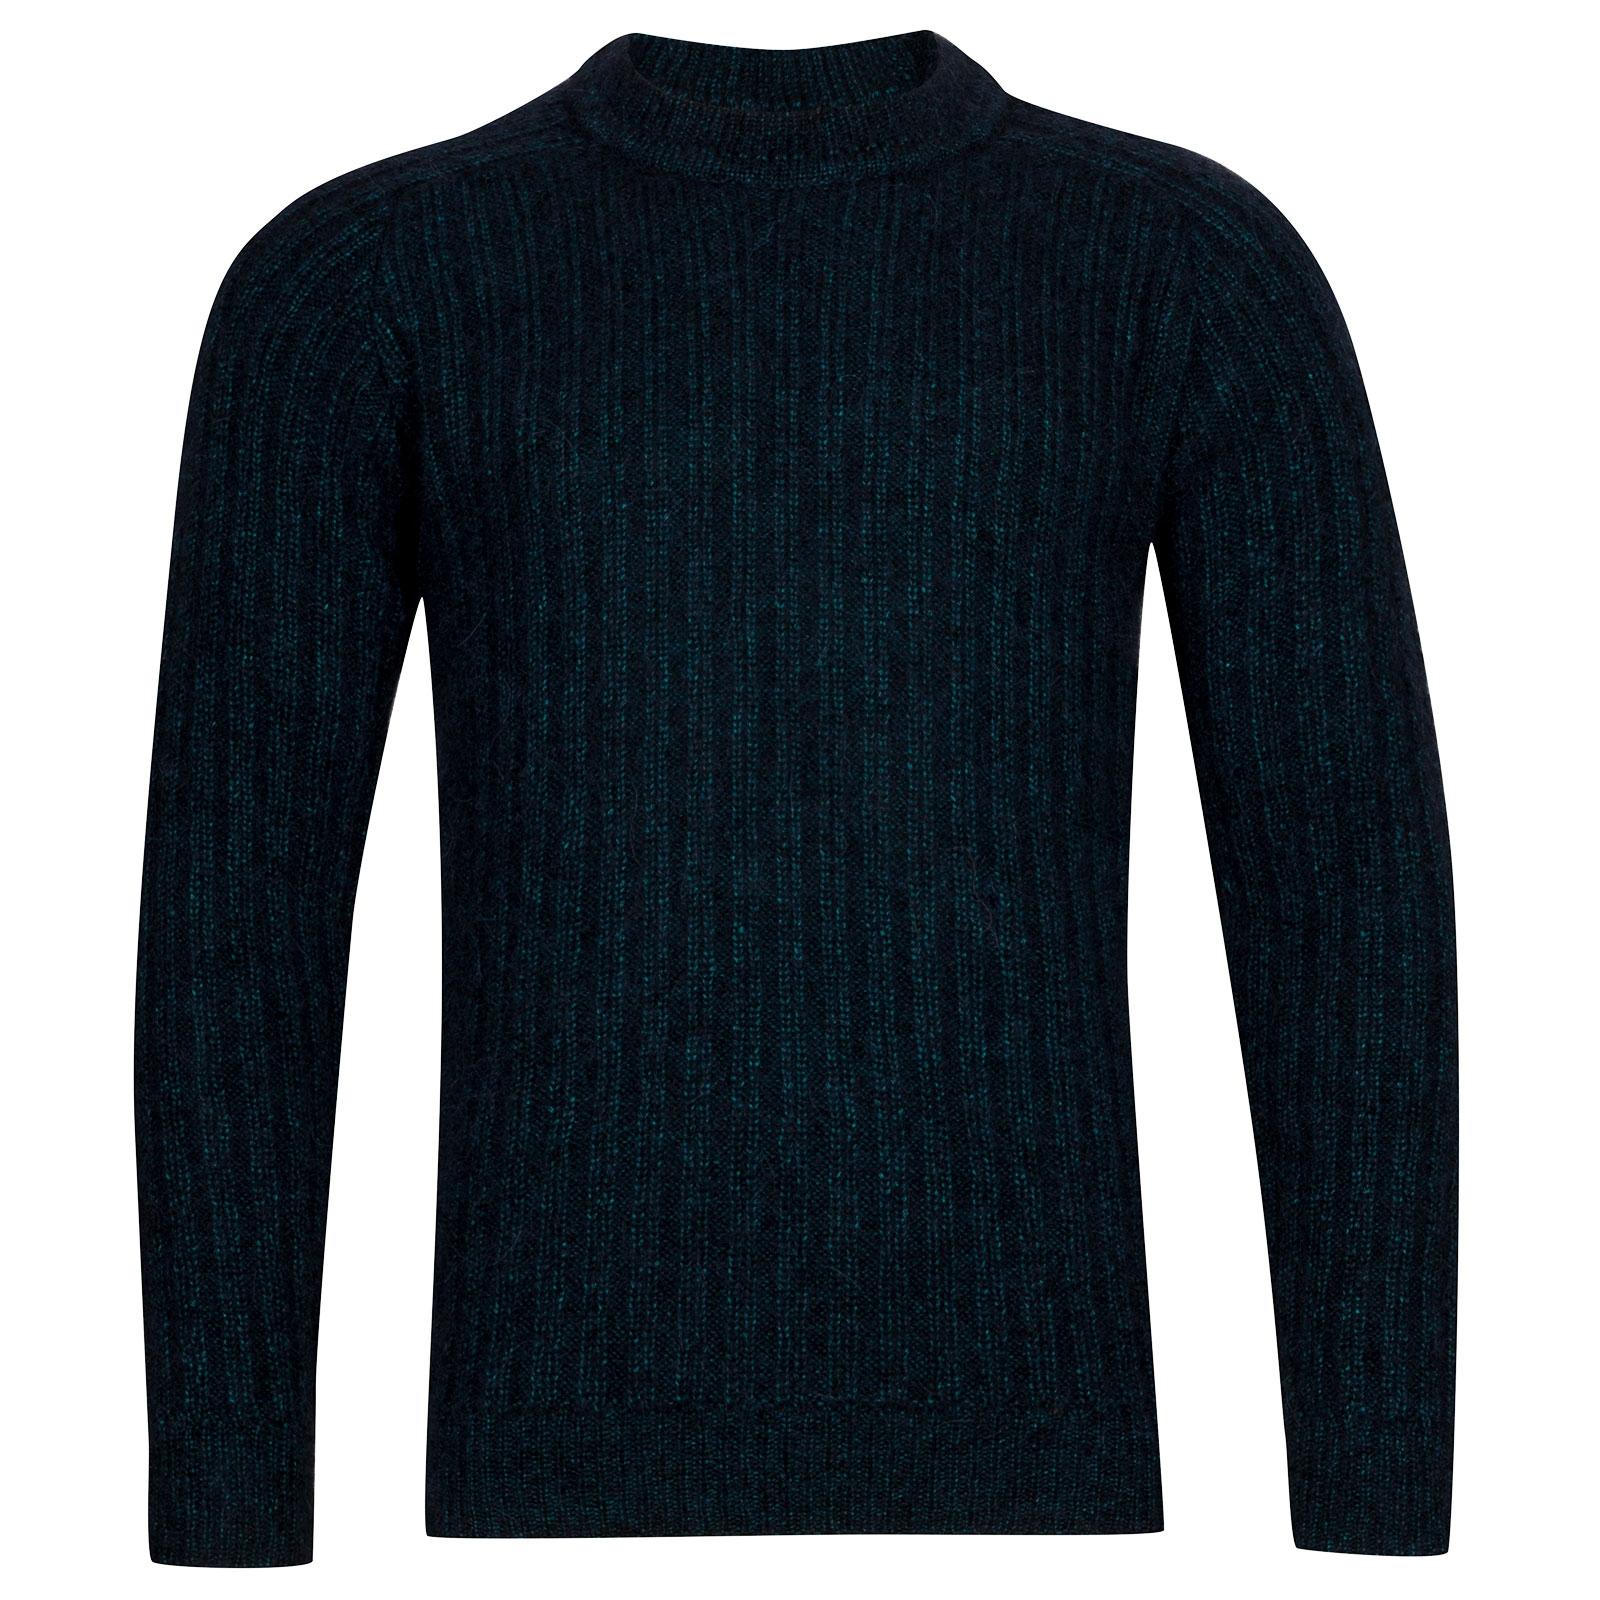 John Smedley Salke Viscose Blend Pullover In Boron Green-XXL